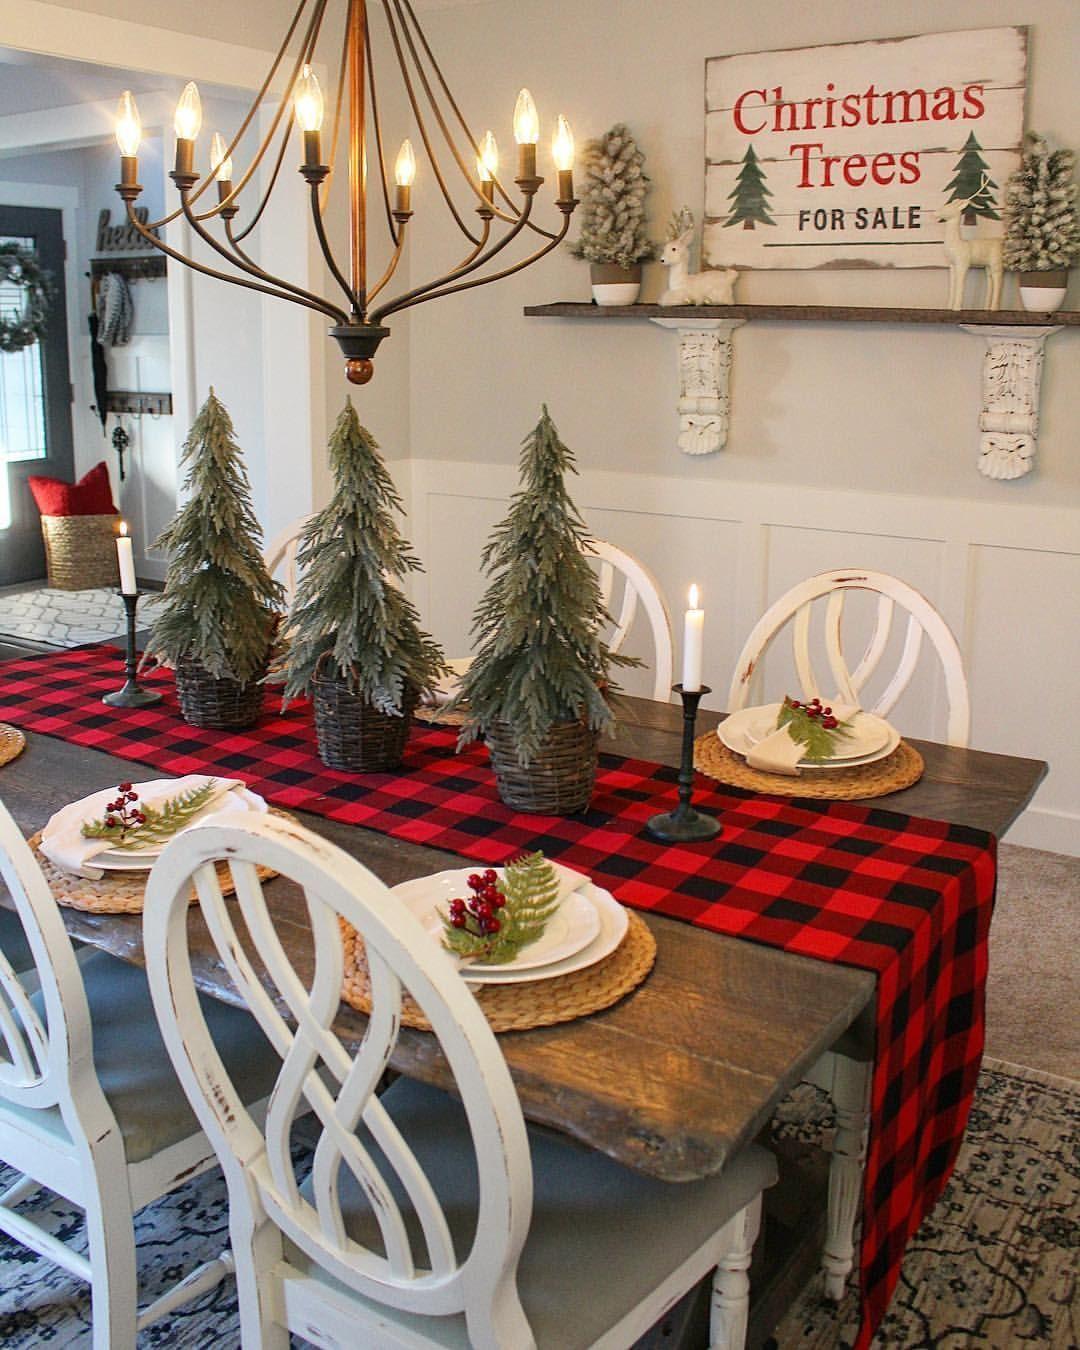 Decor Steals Merry Christmas Sign Christmas Decorations Farmhouse Christmas Decor Holiday Decor